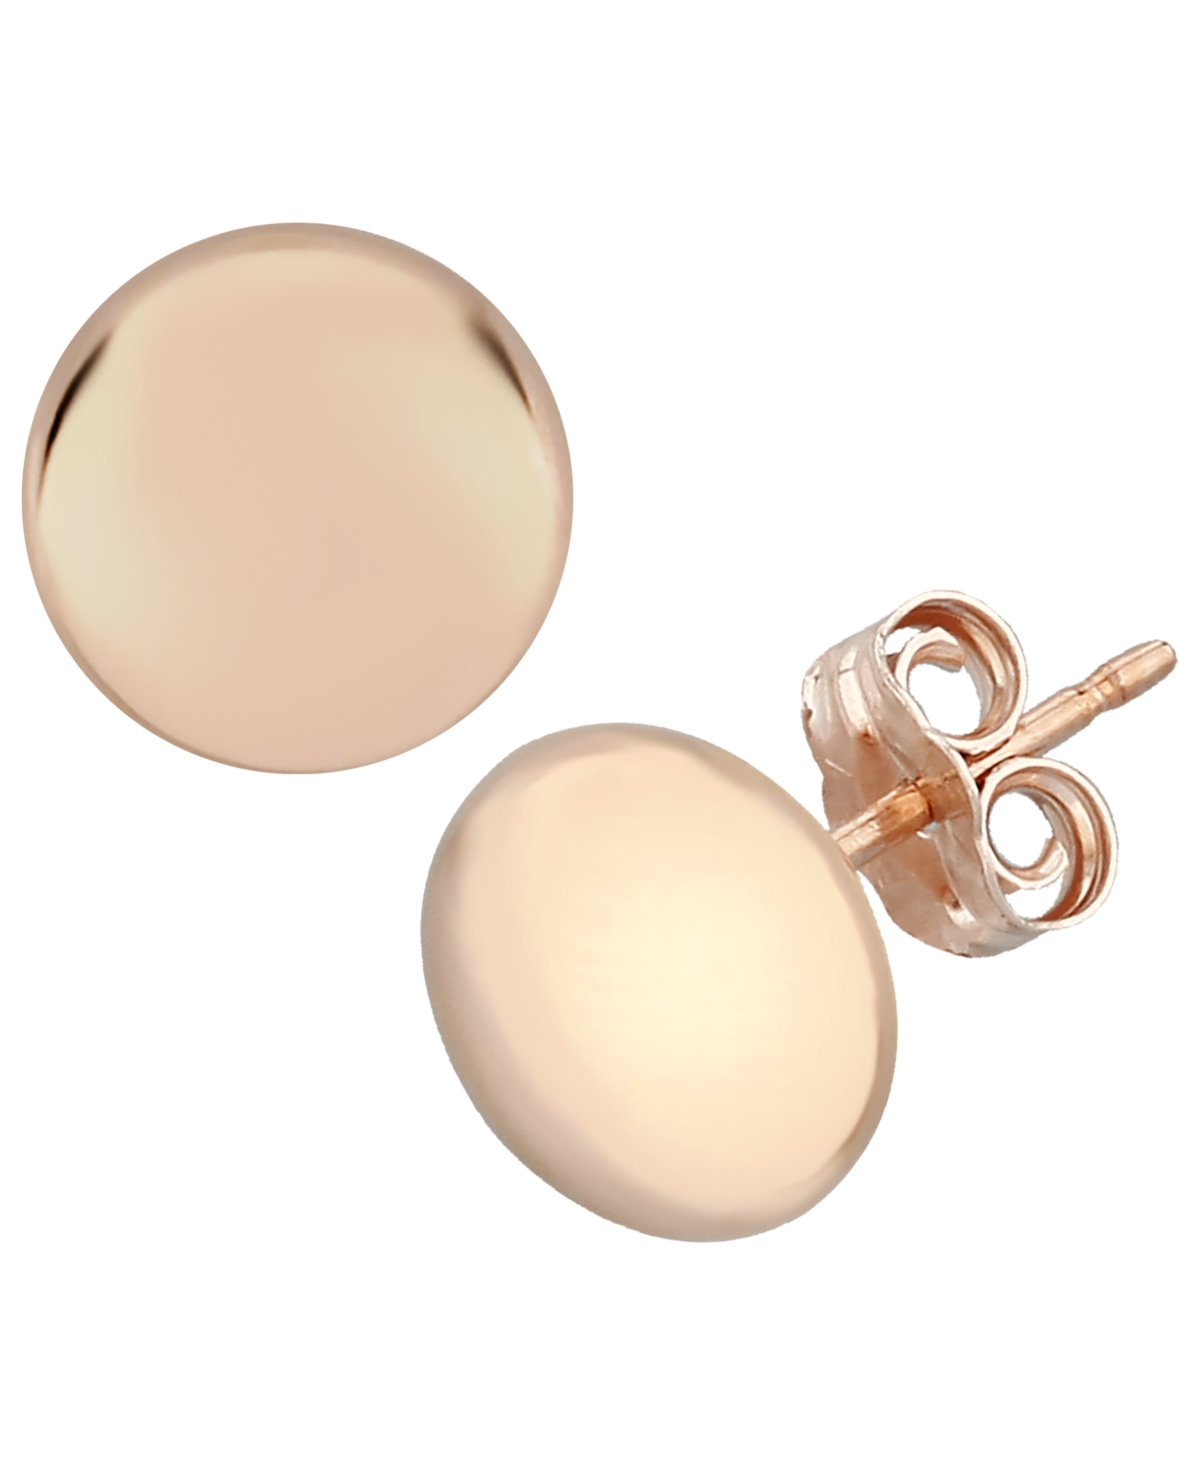 Flat Ball Stud Earrings Set in 14k Rose Gold (7mm)